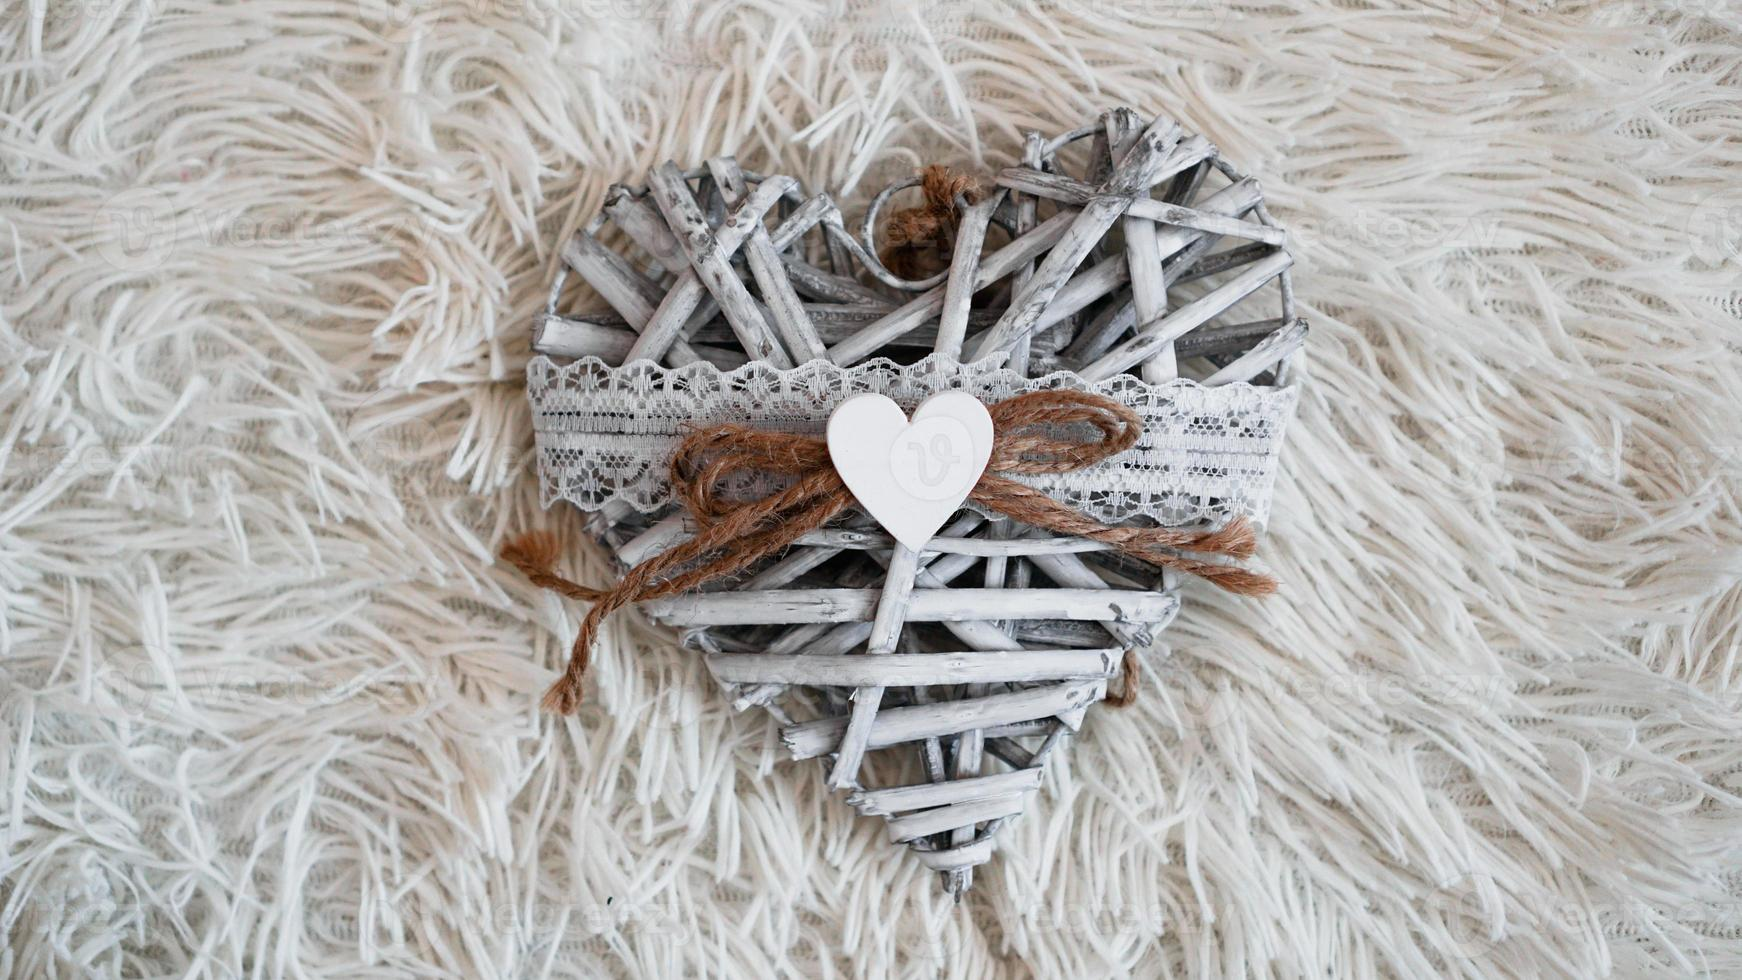 coração artesanal vintage no cobertor branco macio. conceito romântico foto